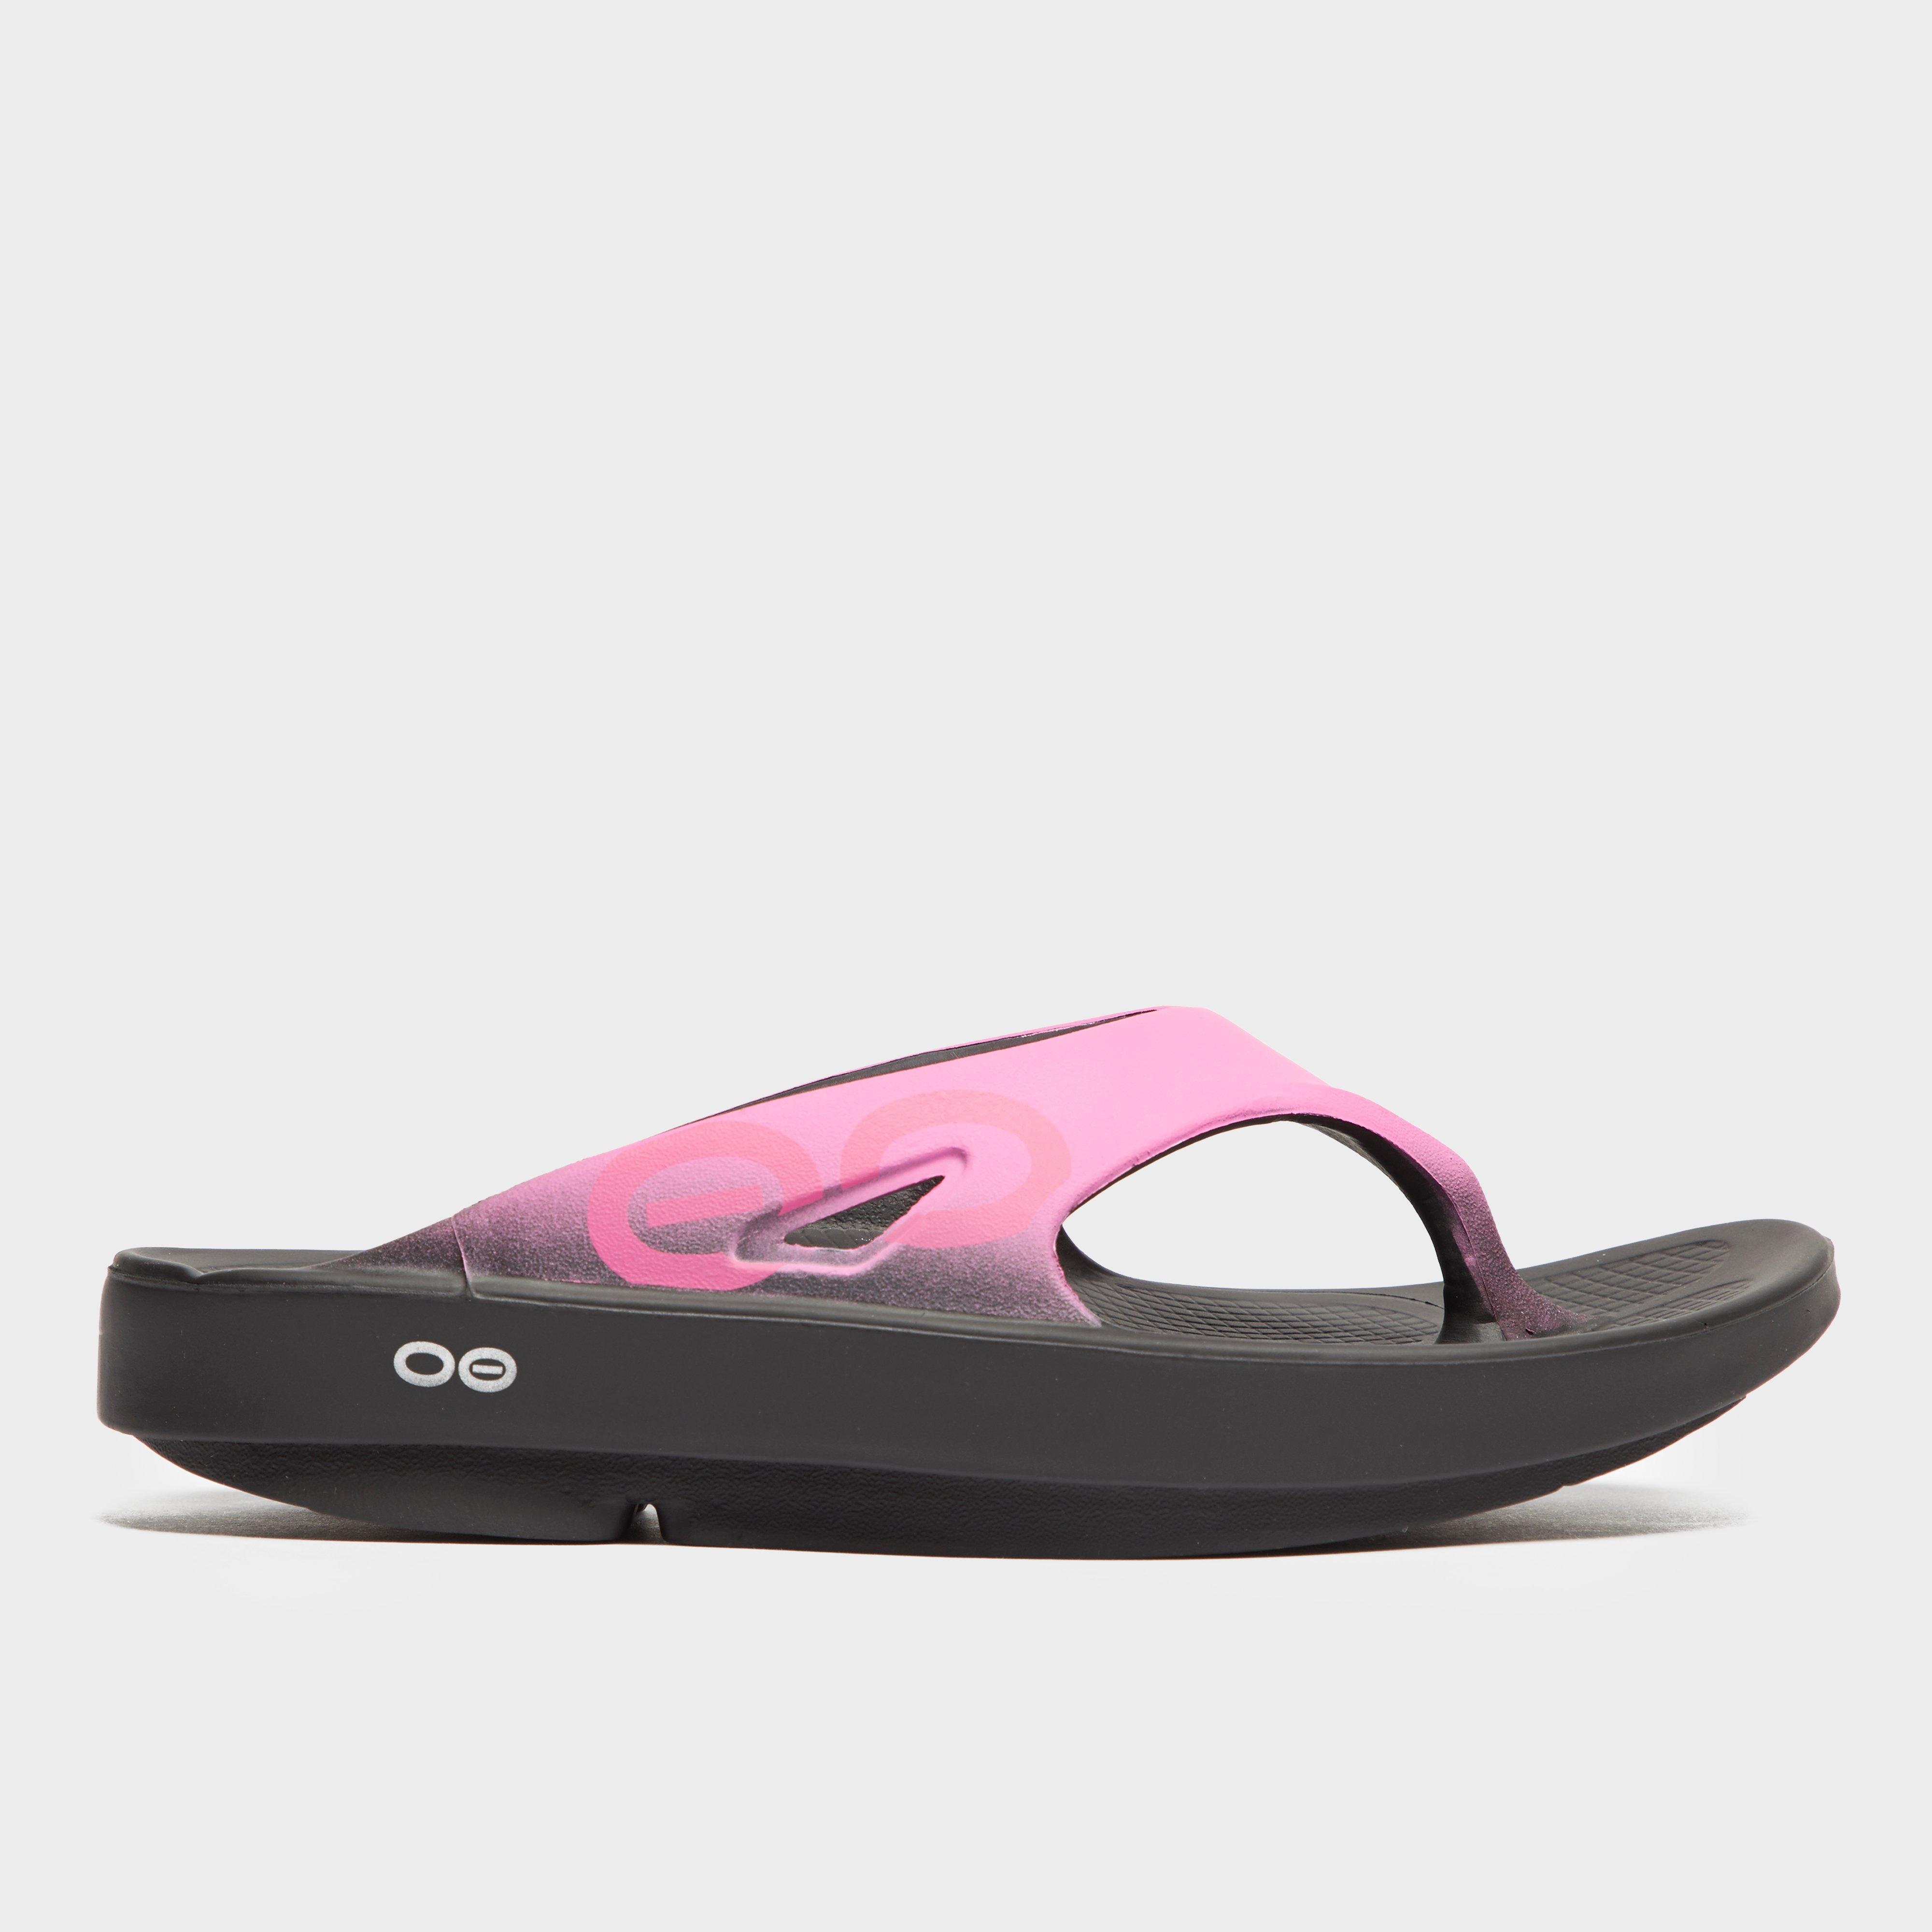 Oofos Oofos Womens OORiginal Sport Slide - Pink, Pink